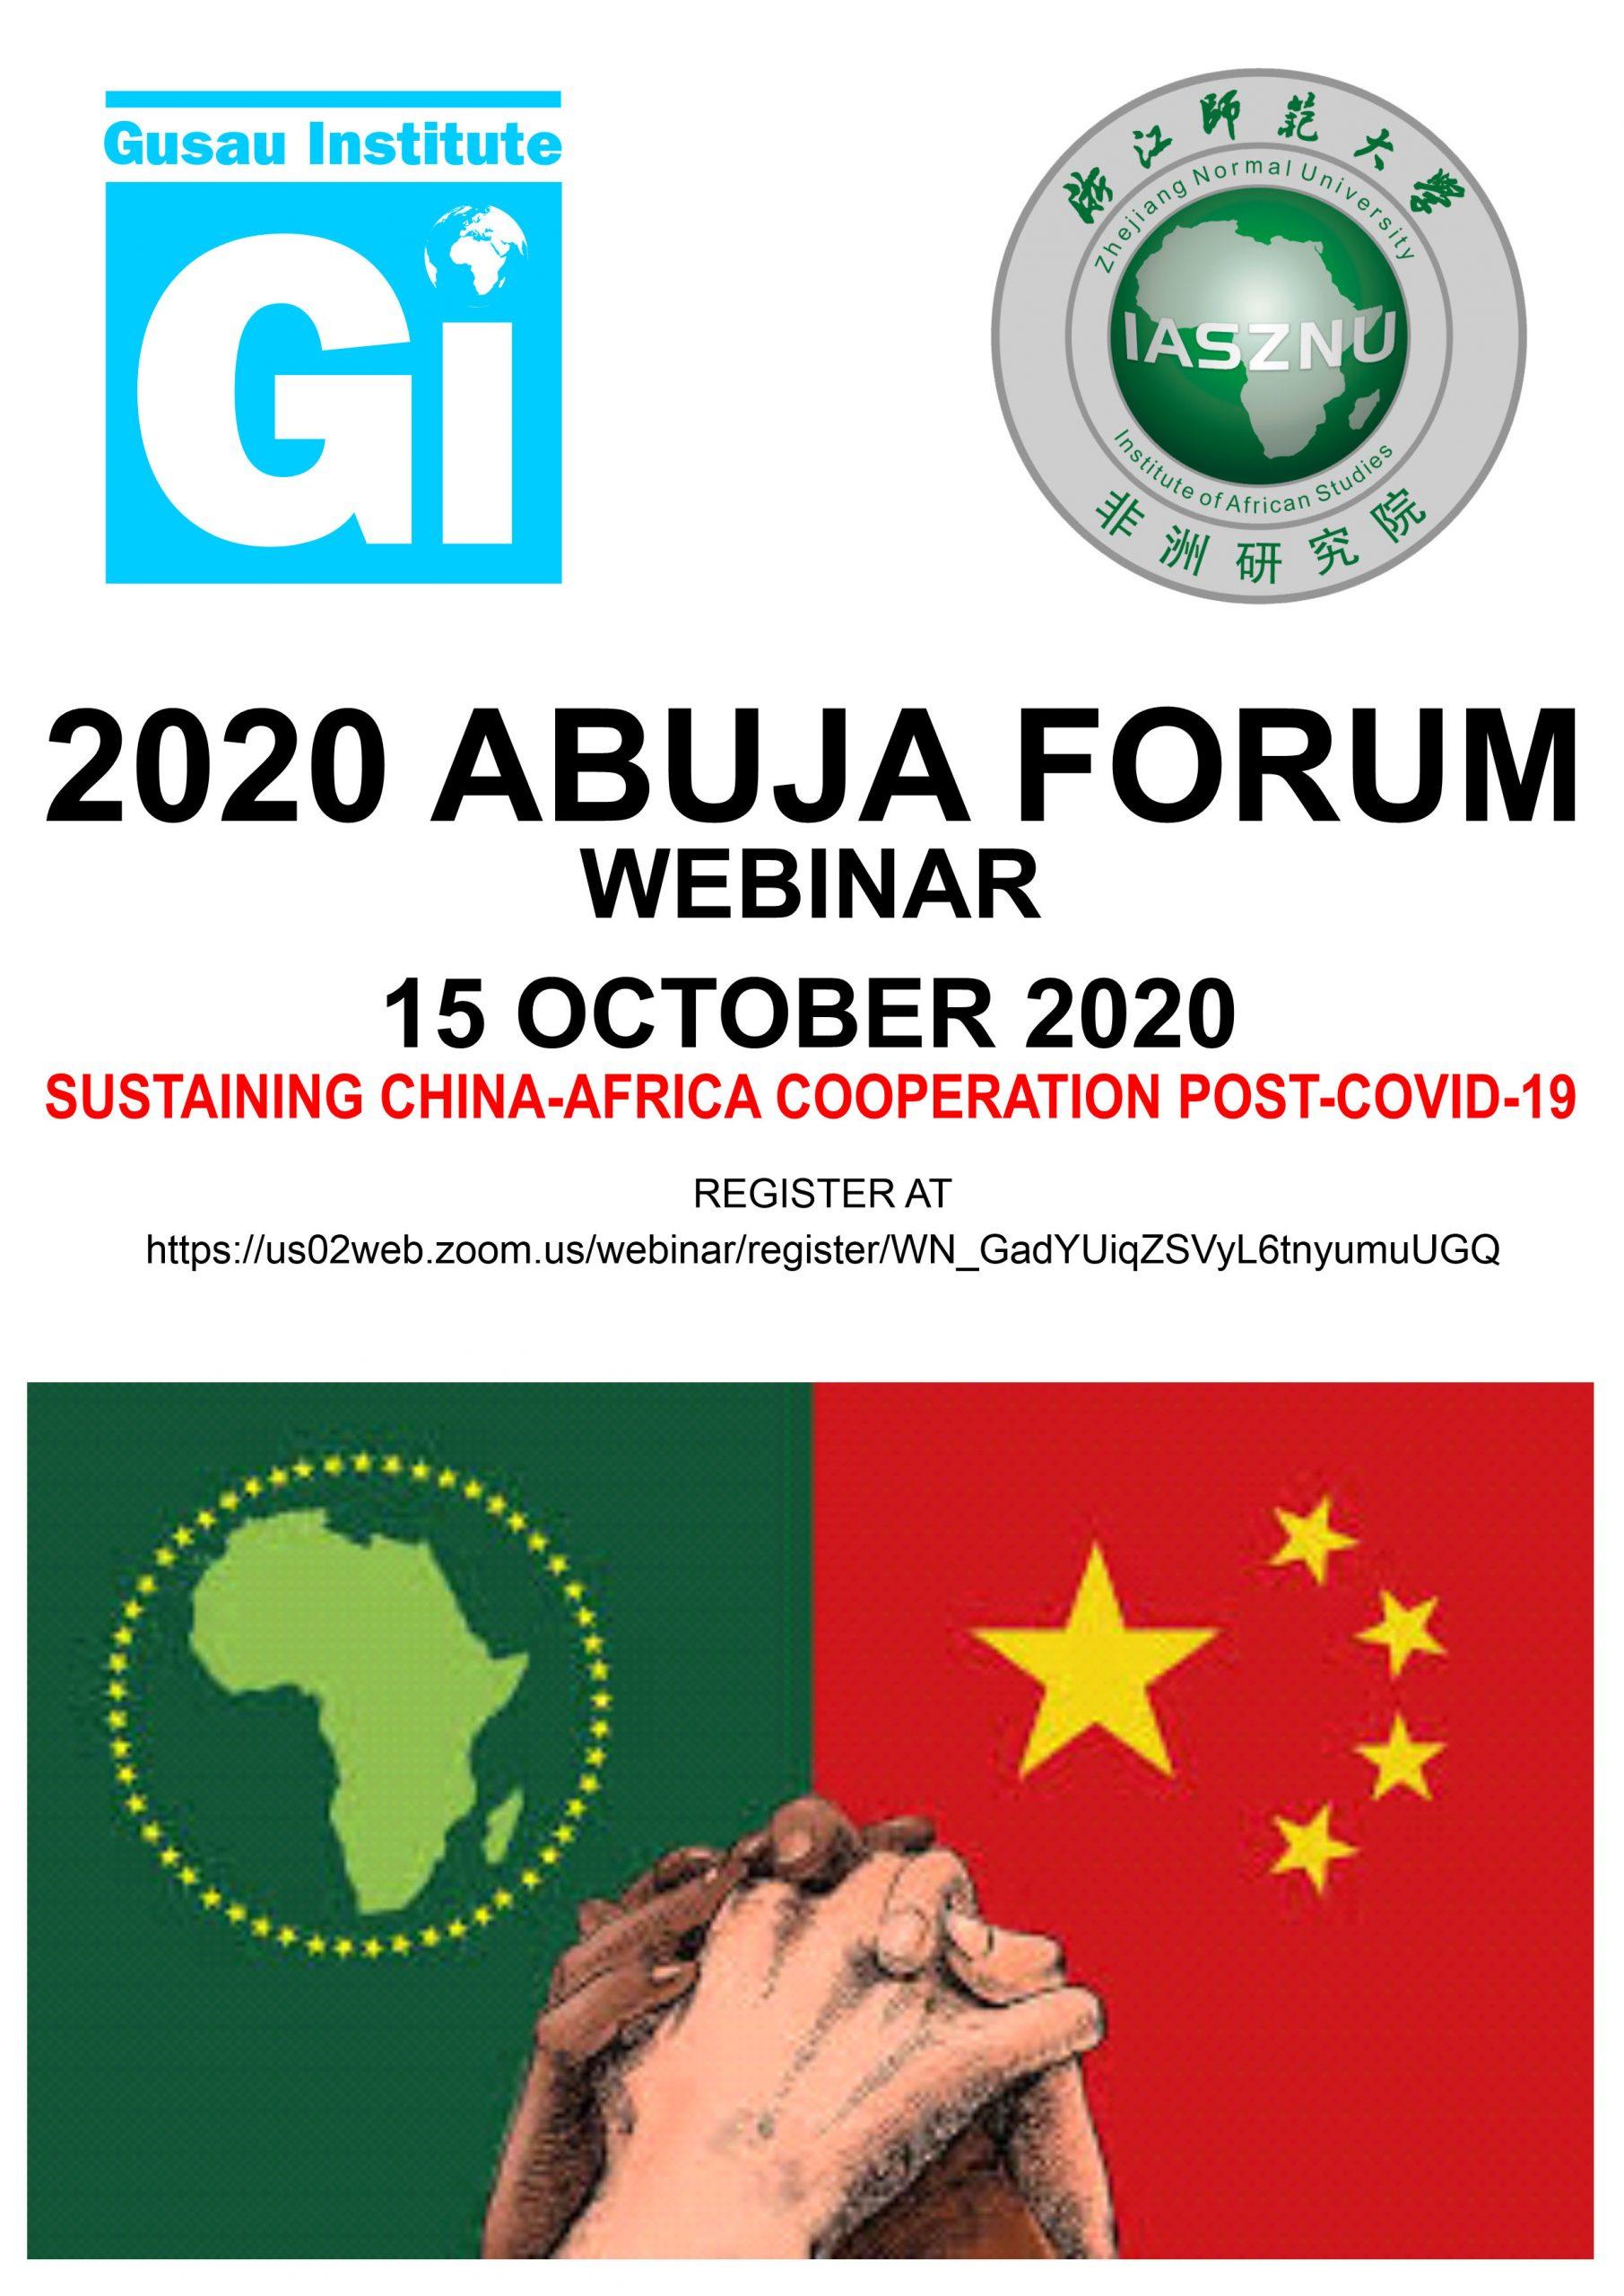 Webinar information for 2020 Abuja Forum